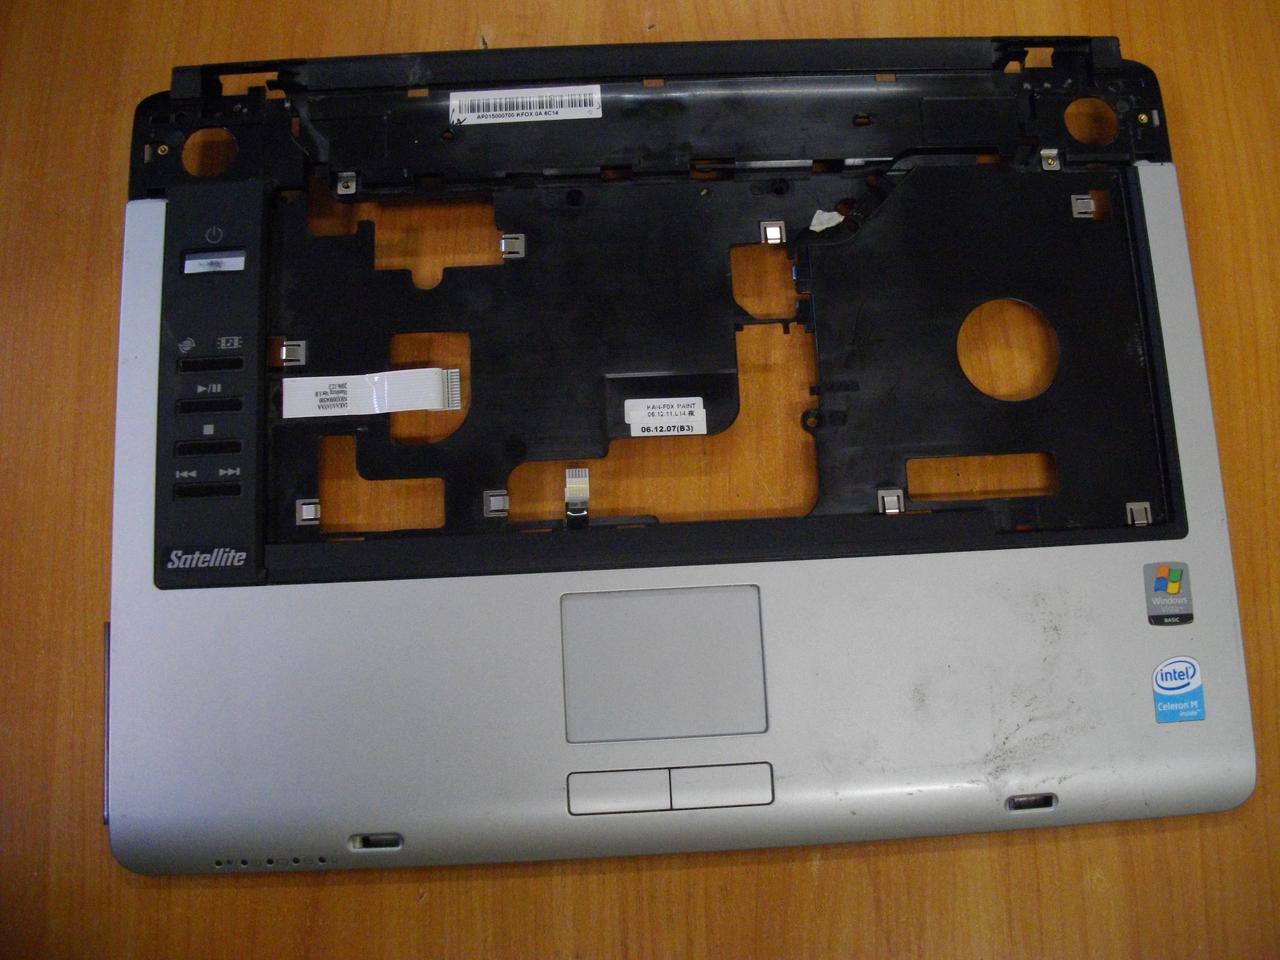 Корпус верх Верхня частина корпусу Toshiba Satellite A135 A135-S226 бу